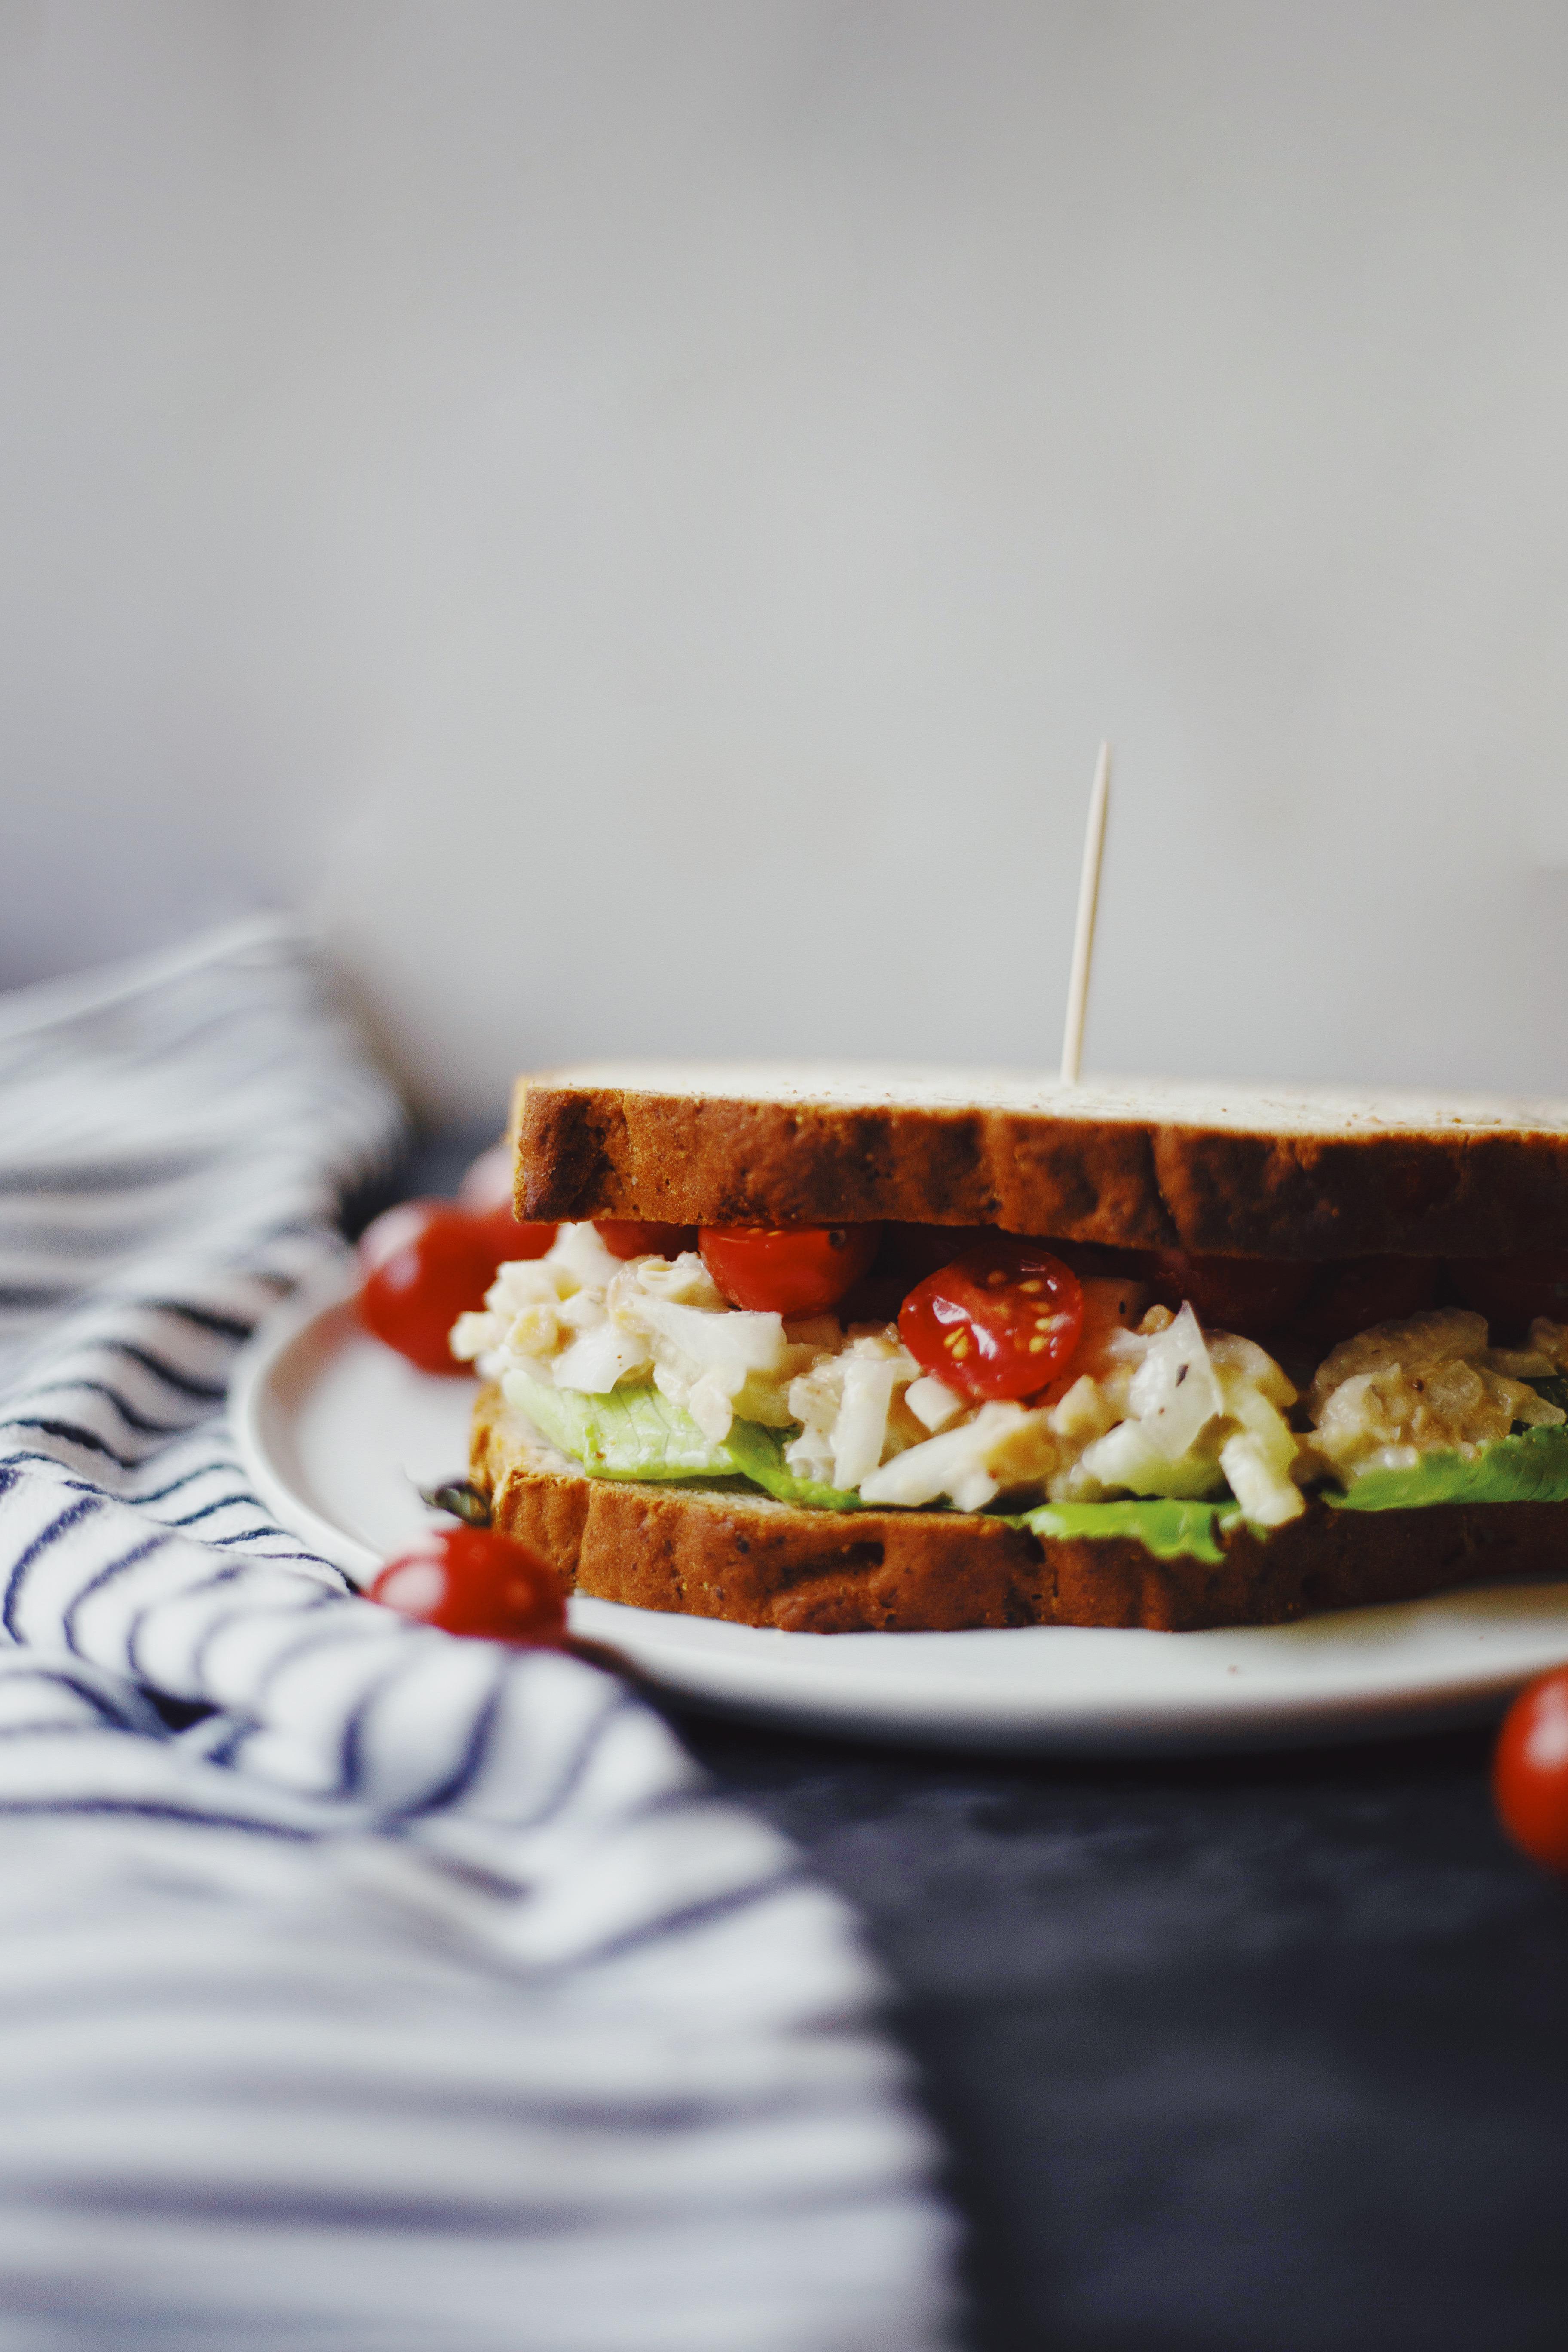 Chickpea salad sandwich on gluten free bread